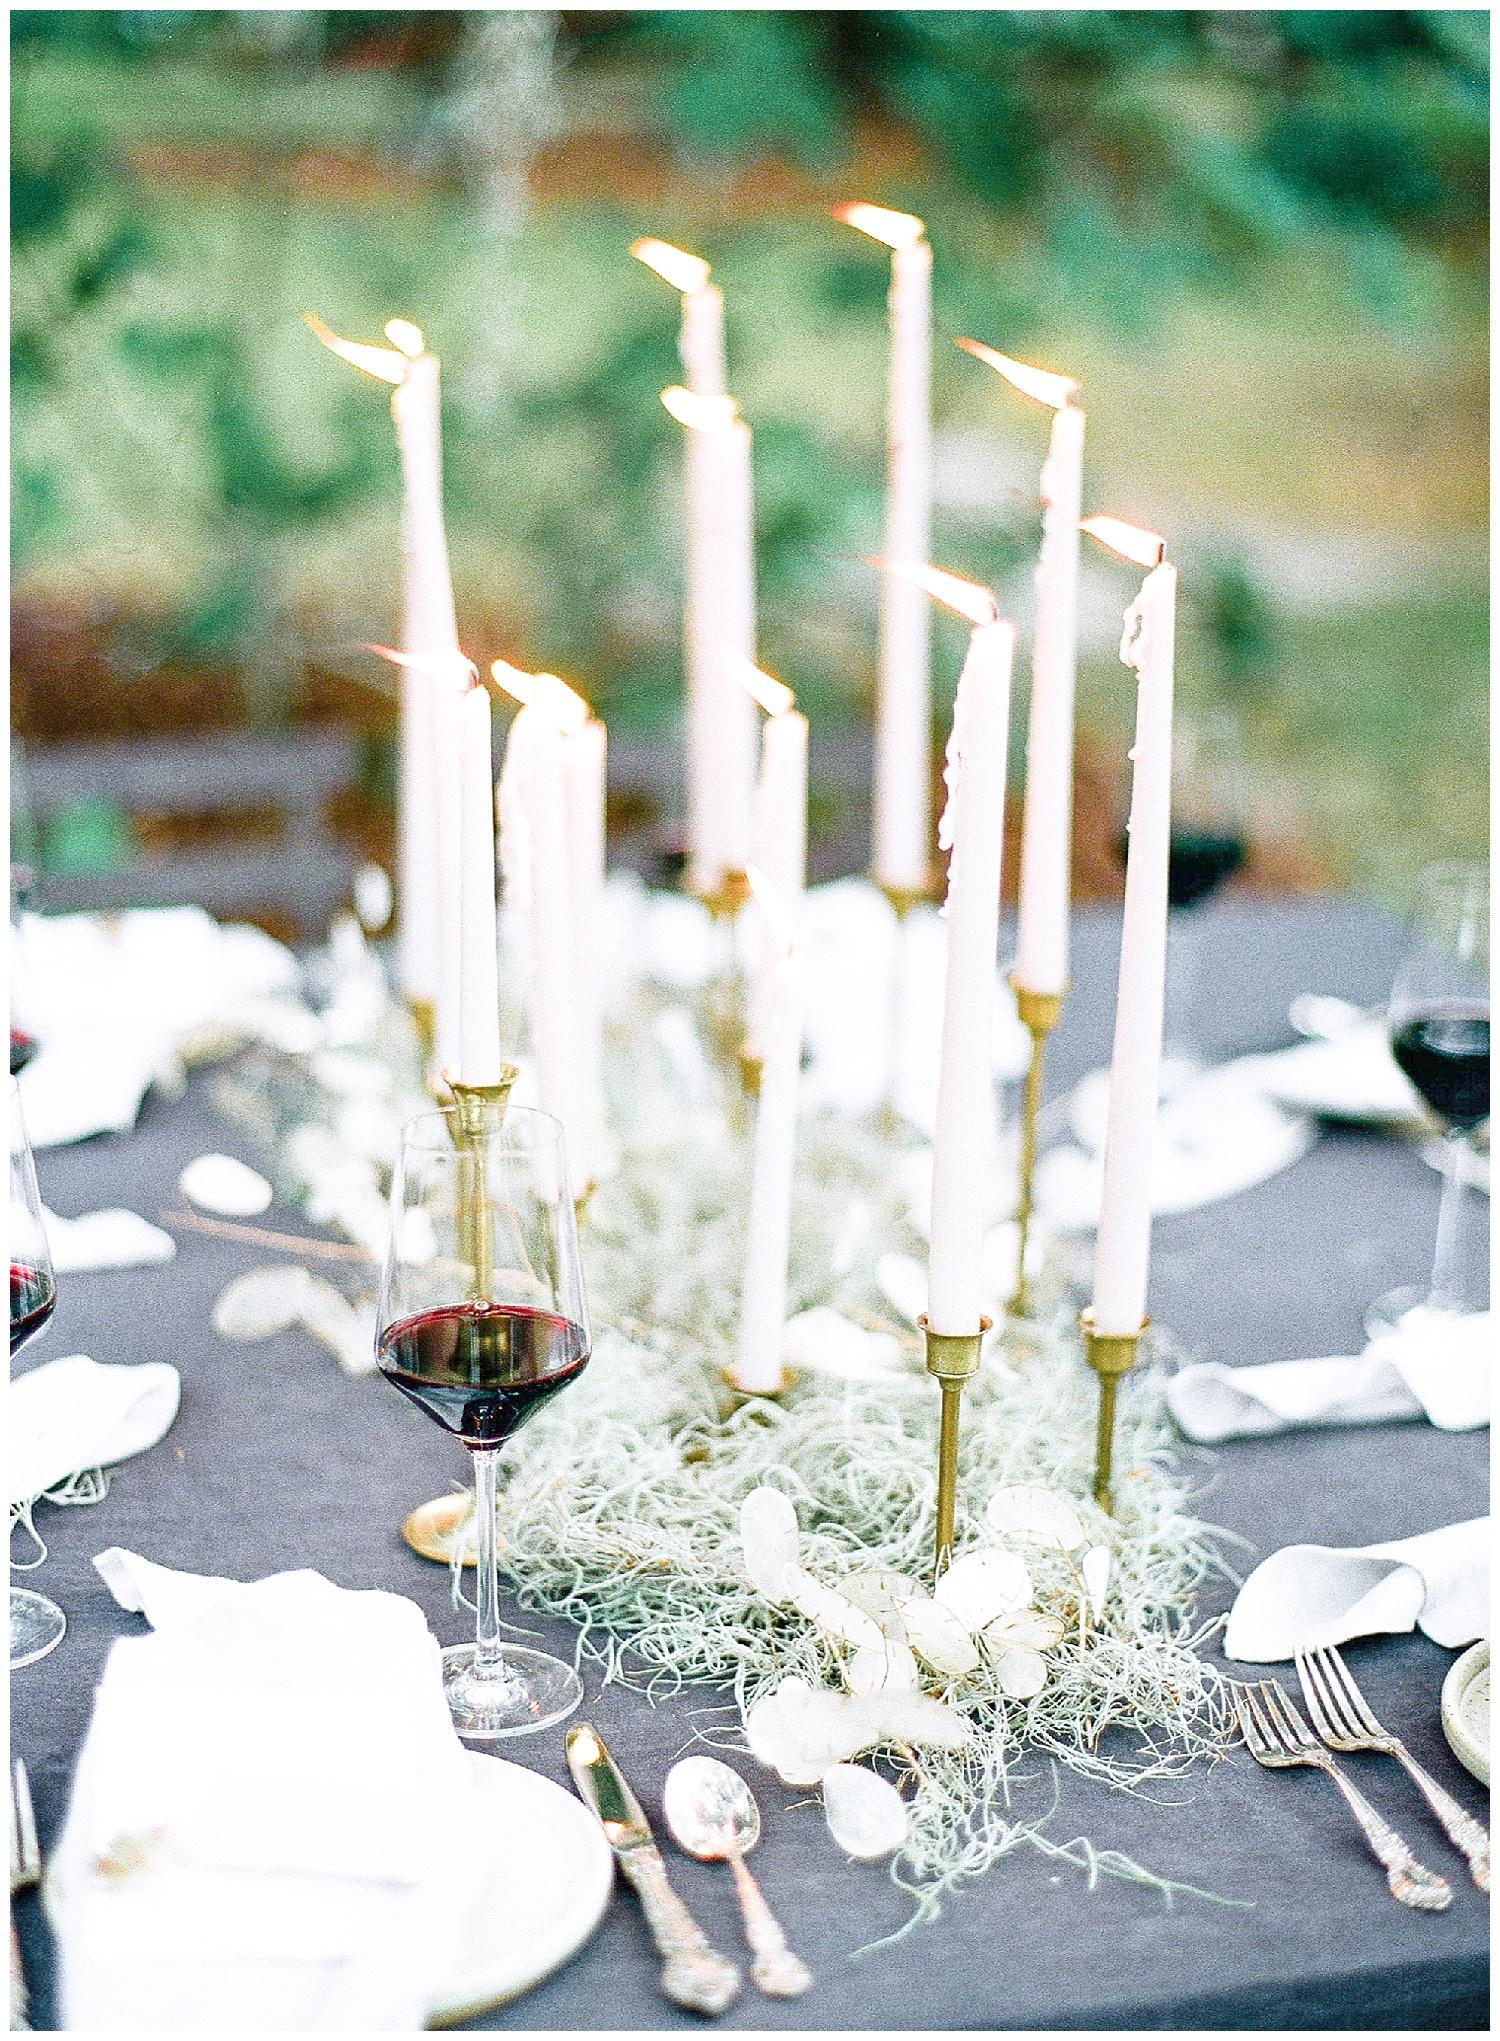 Charleston_Wedding_Janine_Licare_Photography_East_Made_Event_Company_0017.jpg